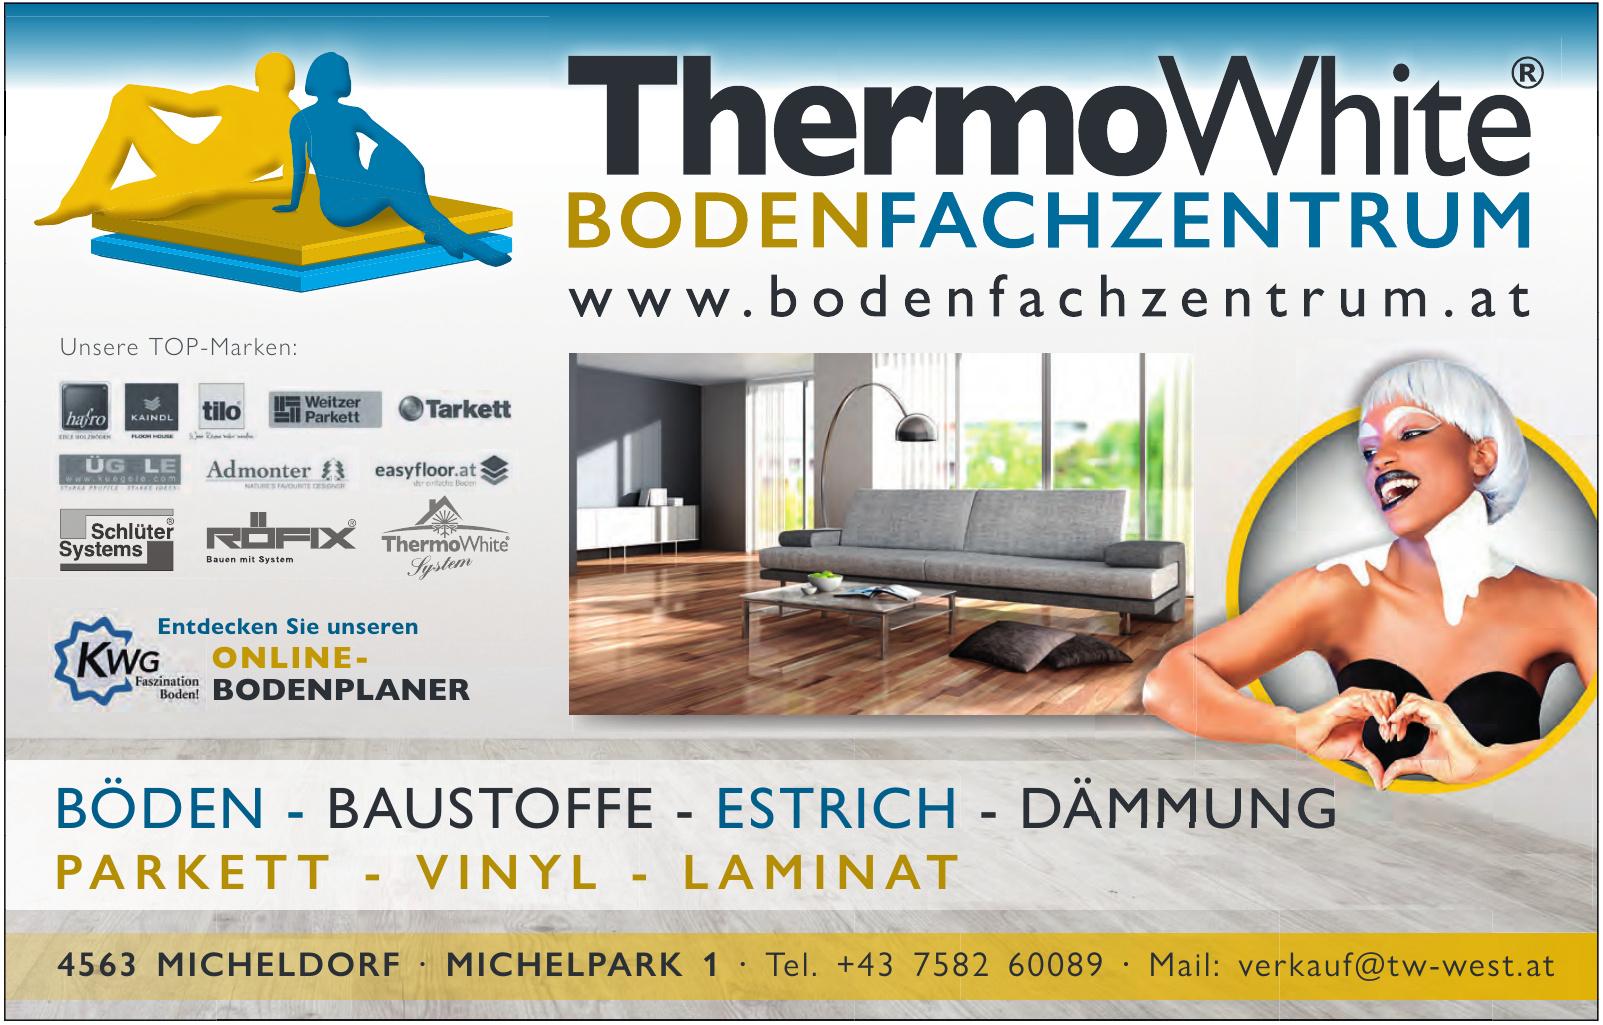 ThermoWhite®-Bodenfachzentrum